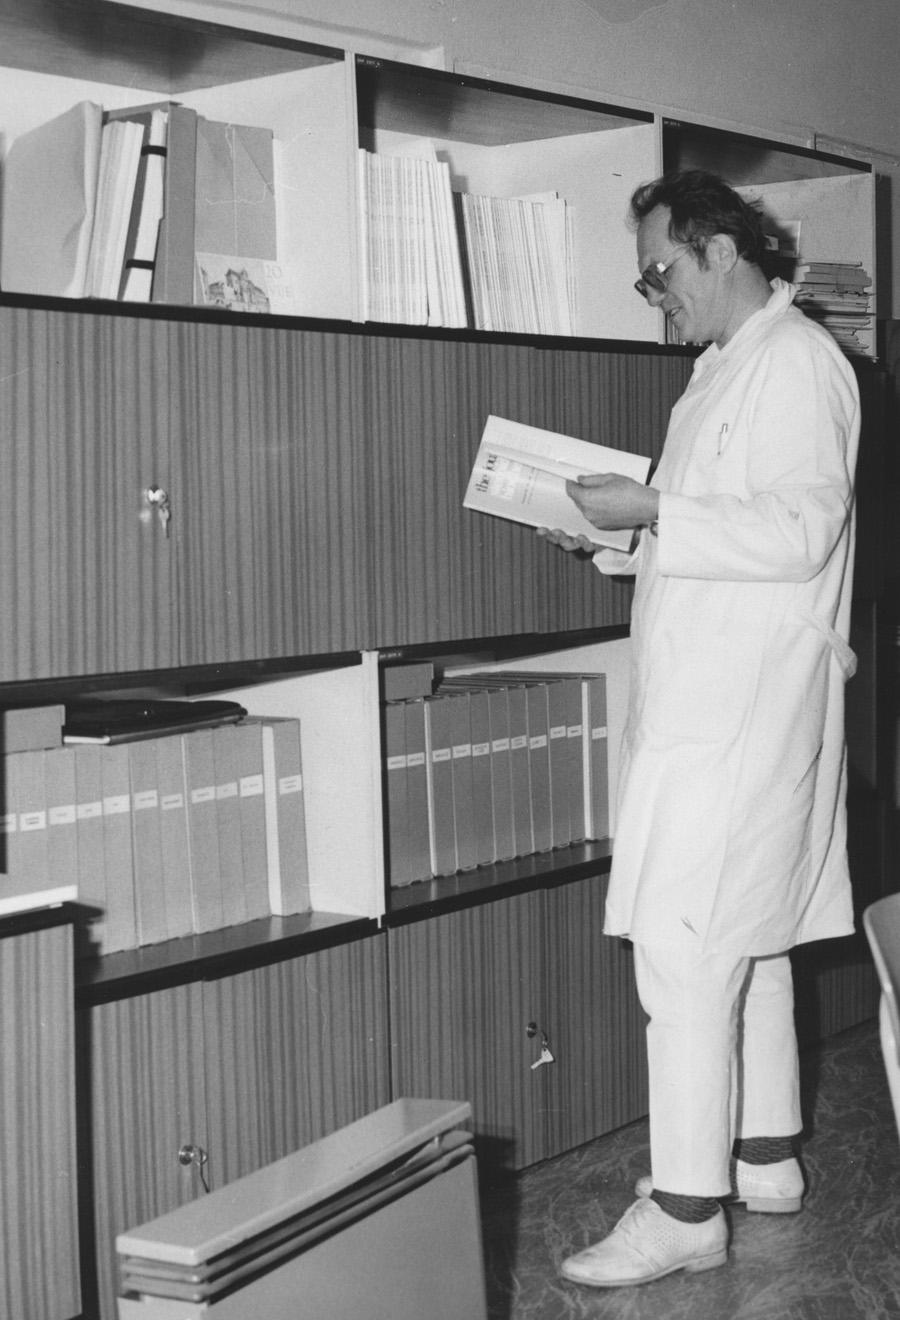 MUDr. RNDr. Luboslav Stárka v roce 1984 v Endokrinologickém ústavu